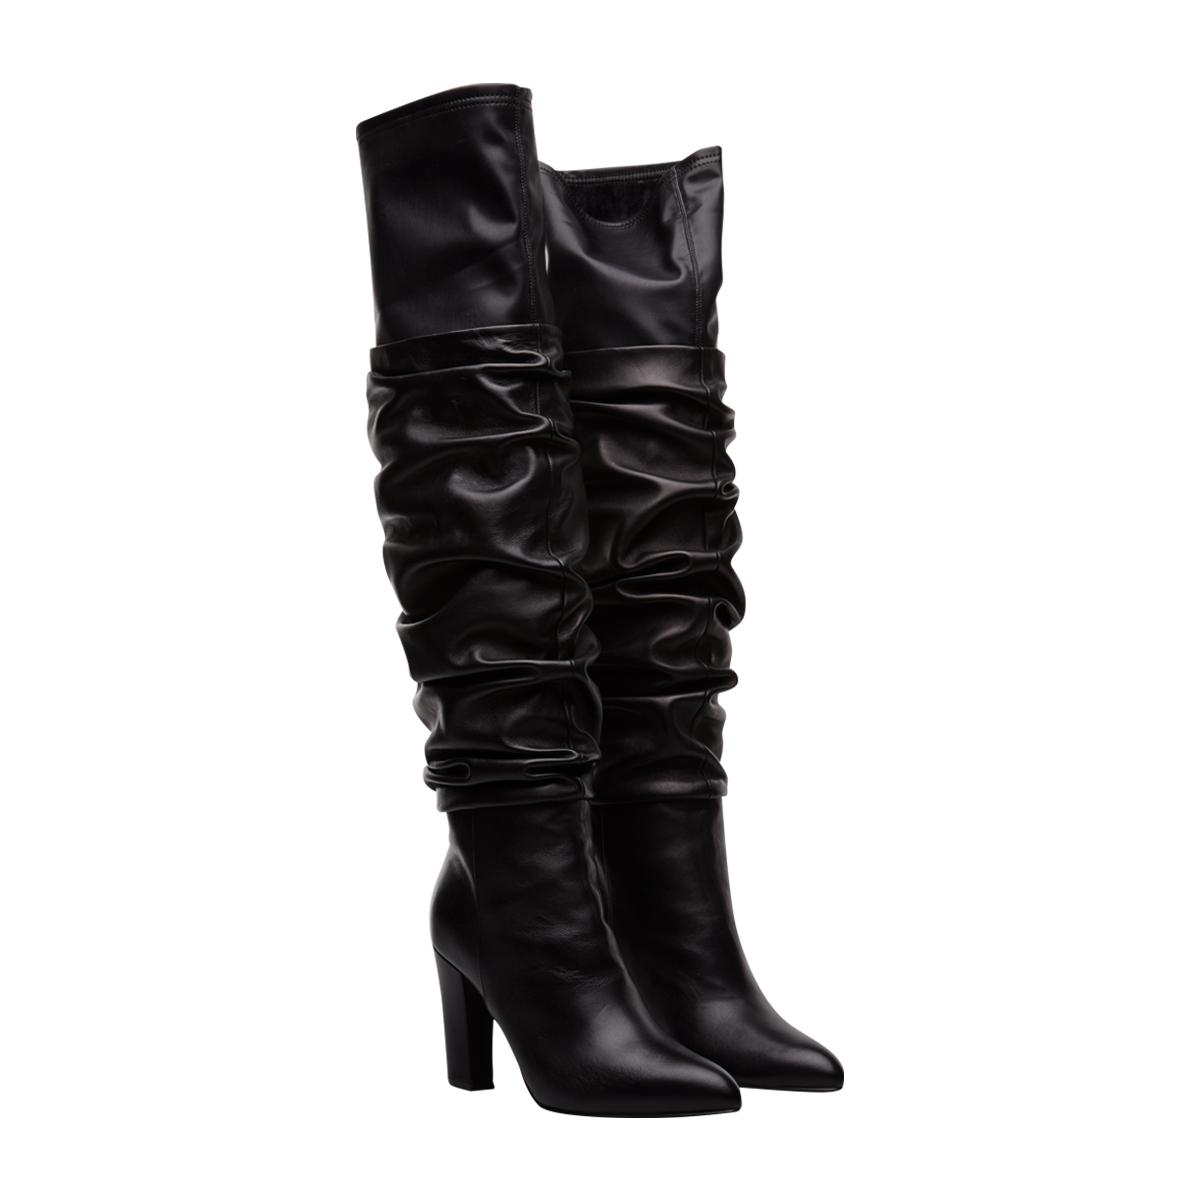 Warp boot